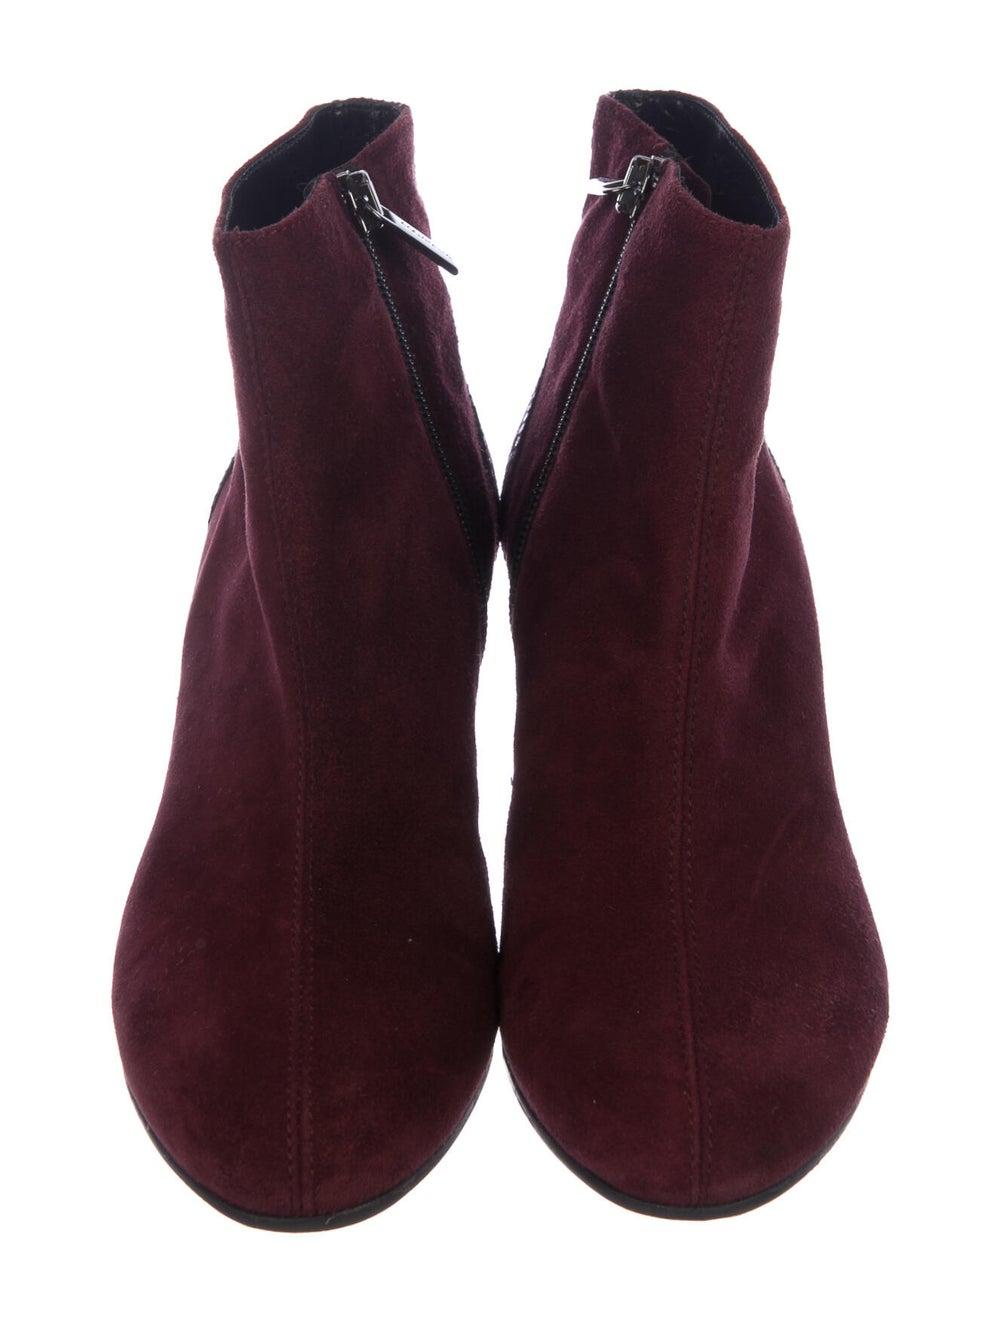 Aquatalia Embossed Suede Boots Red - image 2